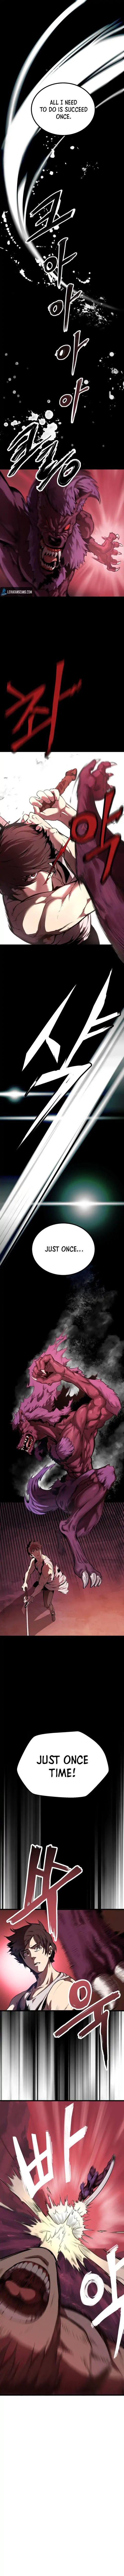 Survival Story Of A Sword King In A Fantasy World Chapter 0 page 2 - Mangakakalots.com